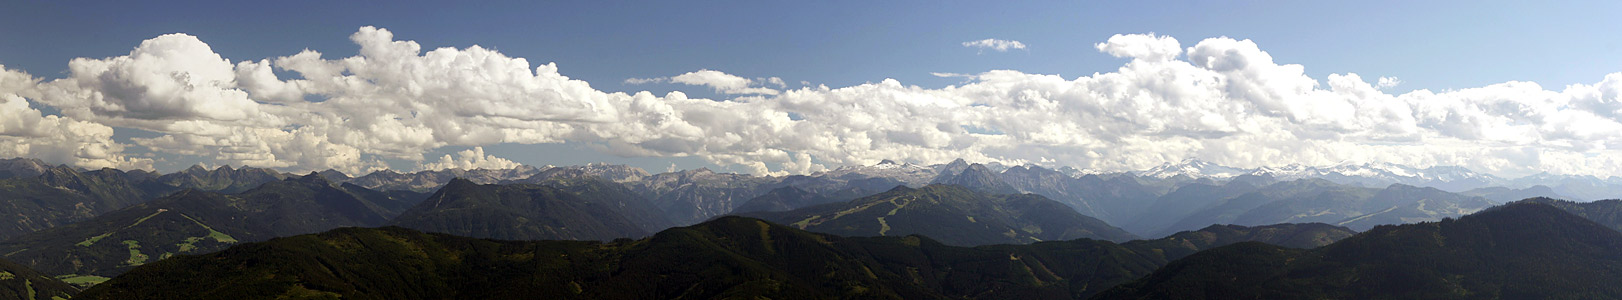 .: Mein erstes Panorama :.